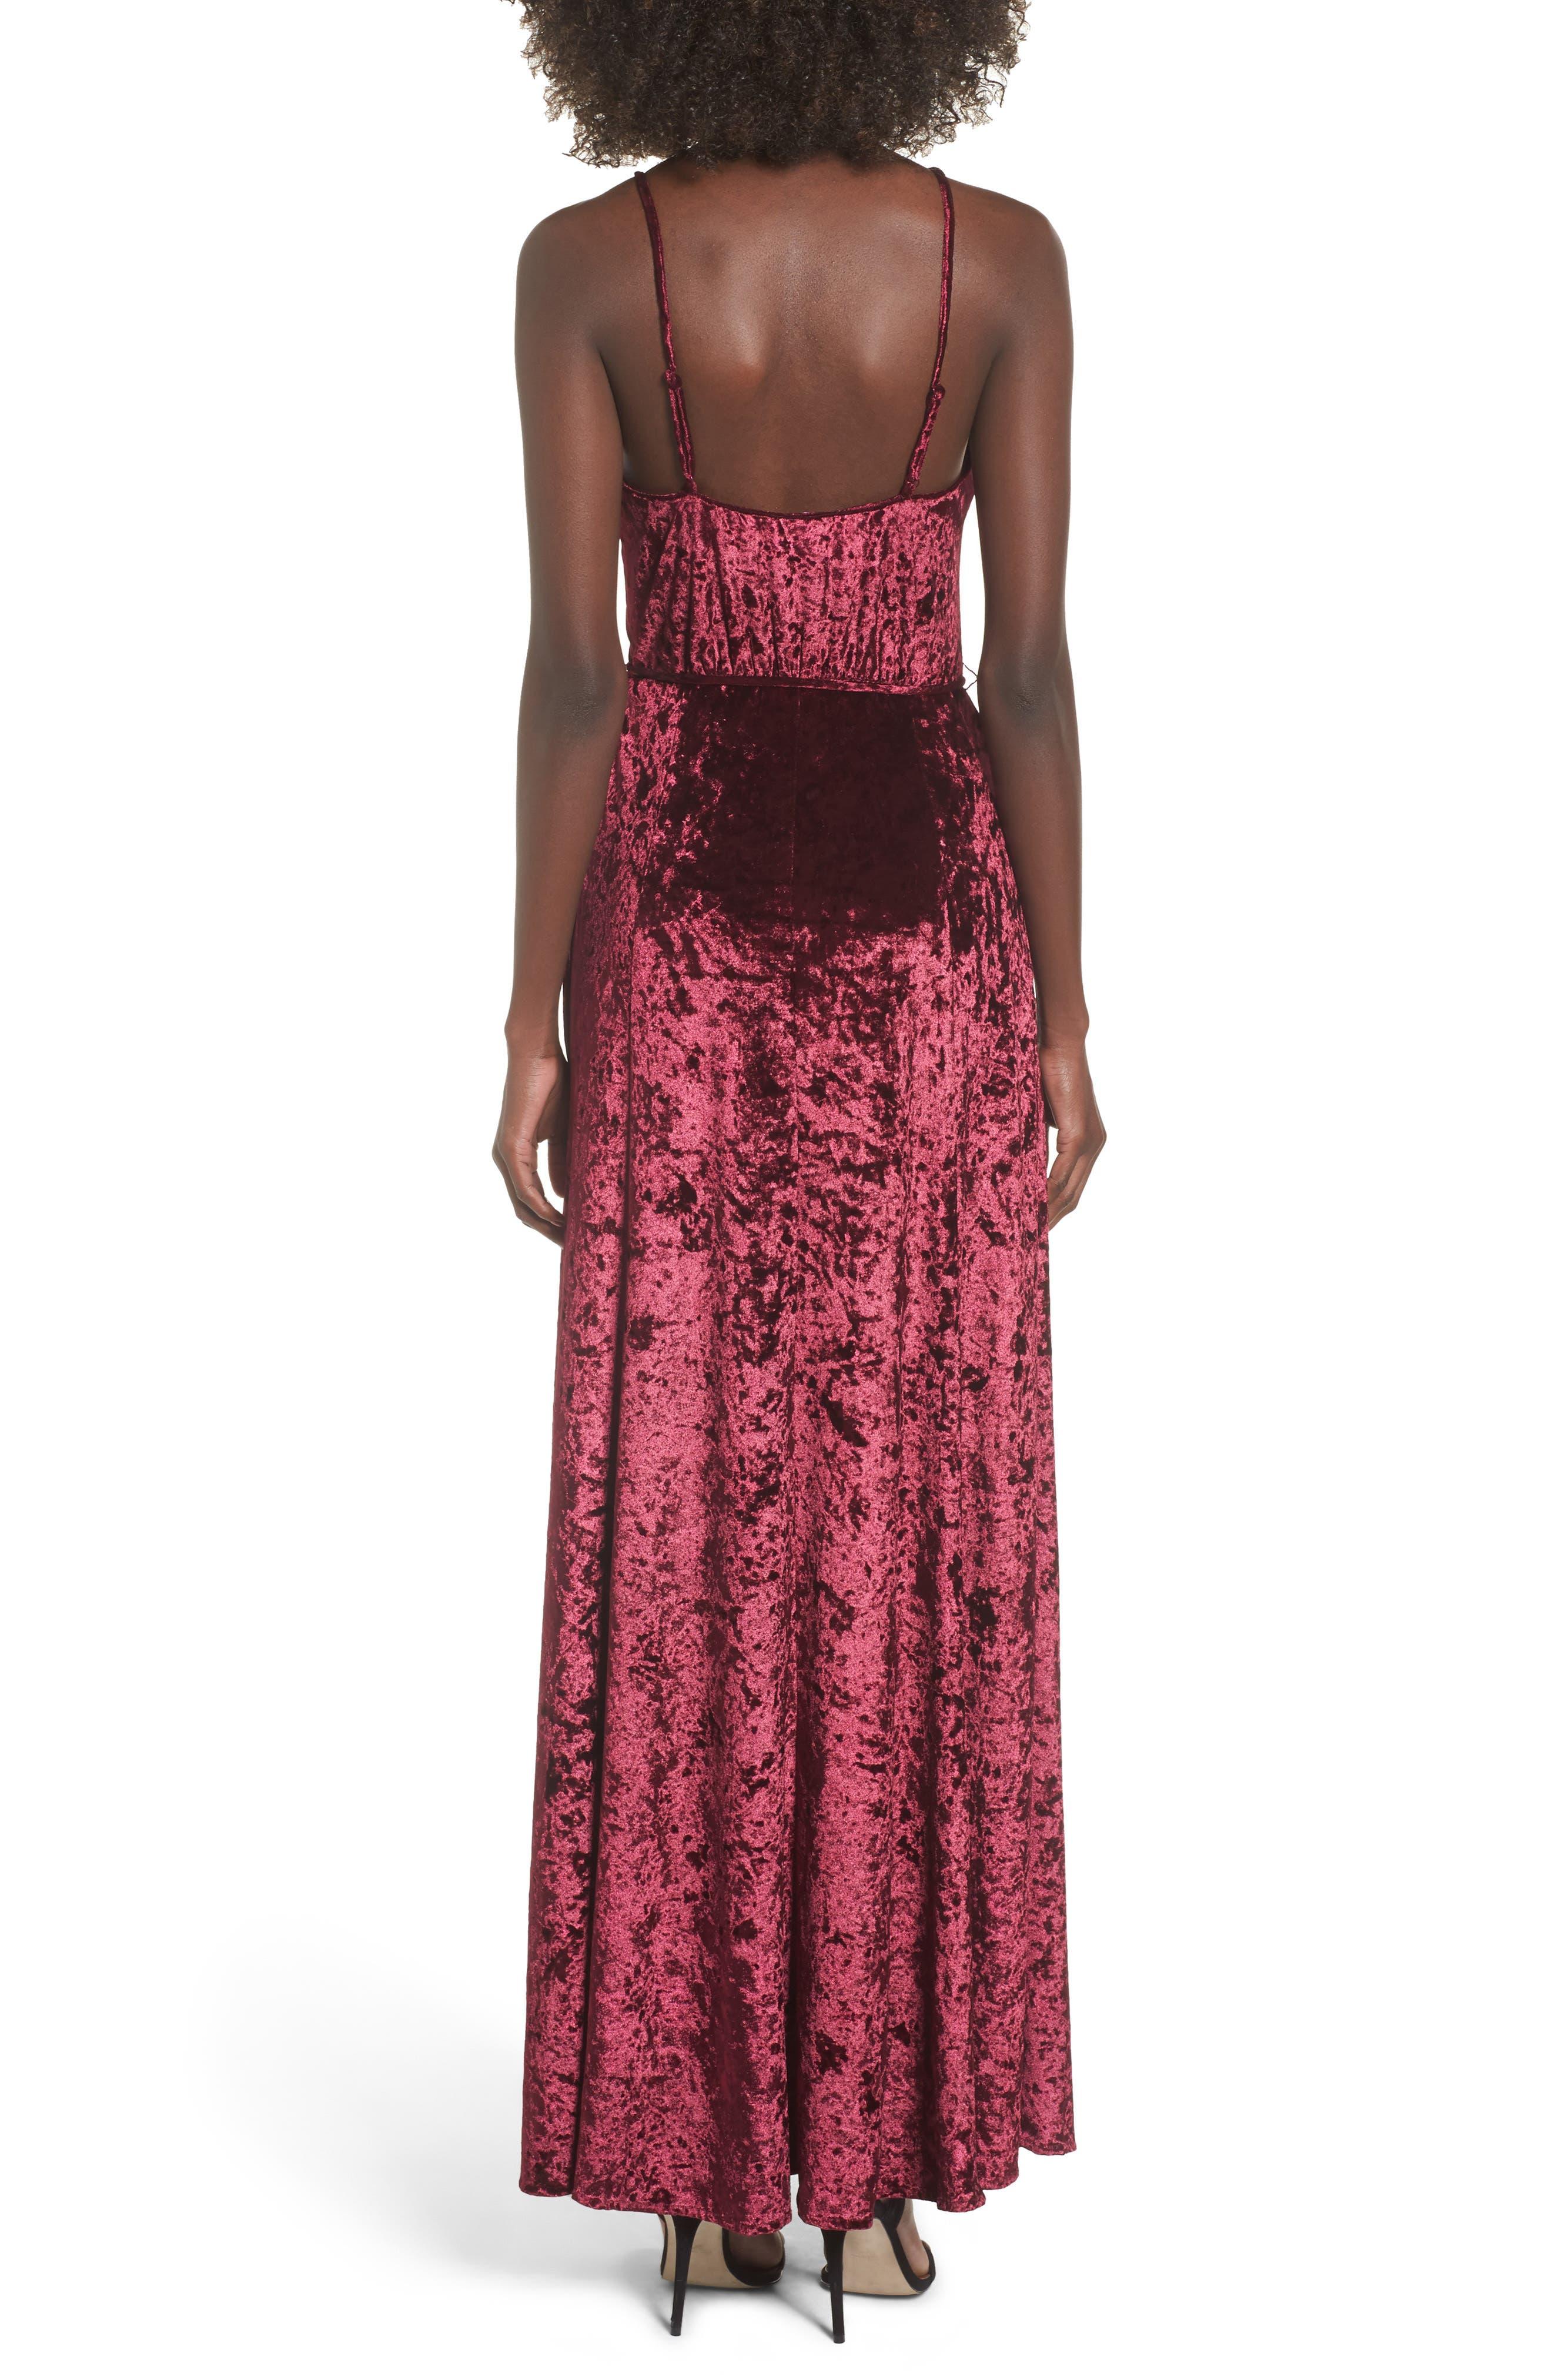 Crenshaw Maxi Dress,                             Alternate thumbnail 2, color,                             Bordeaux